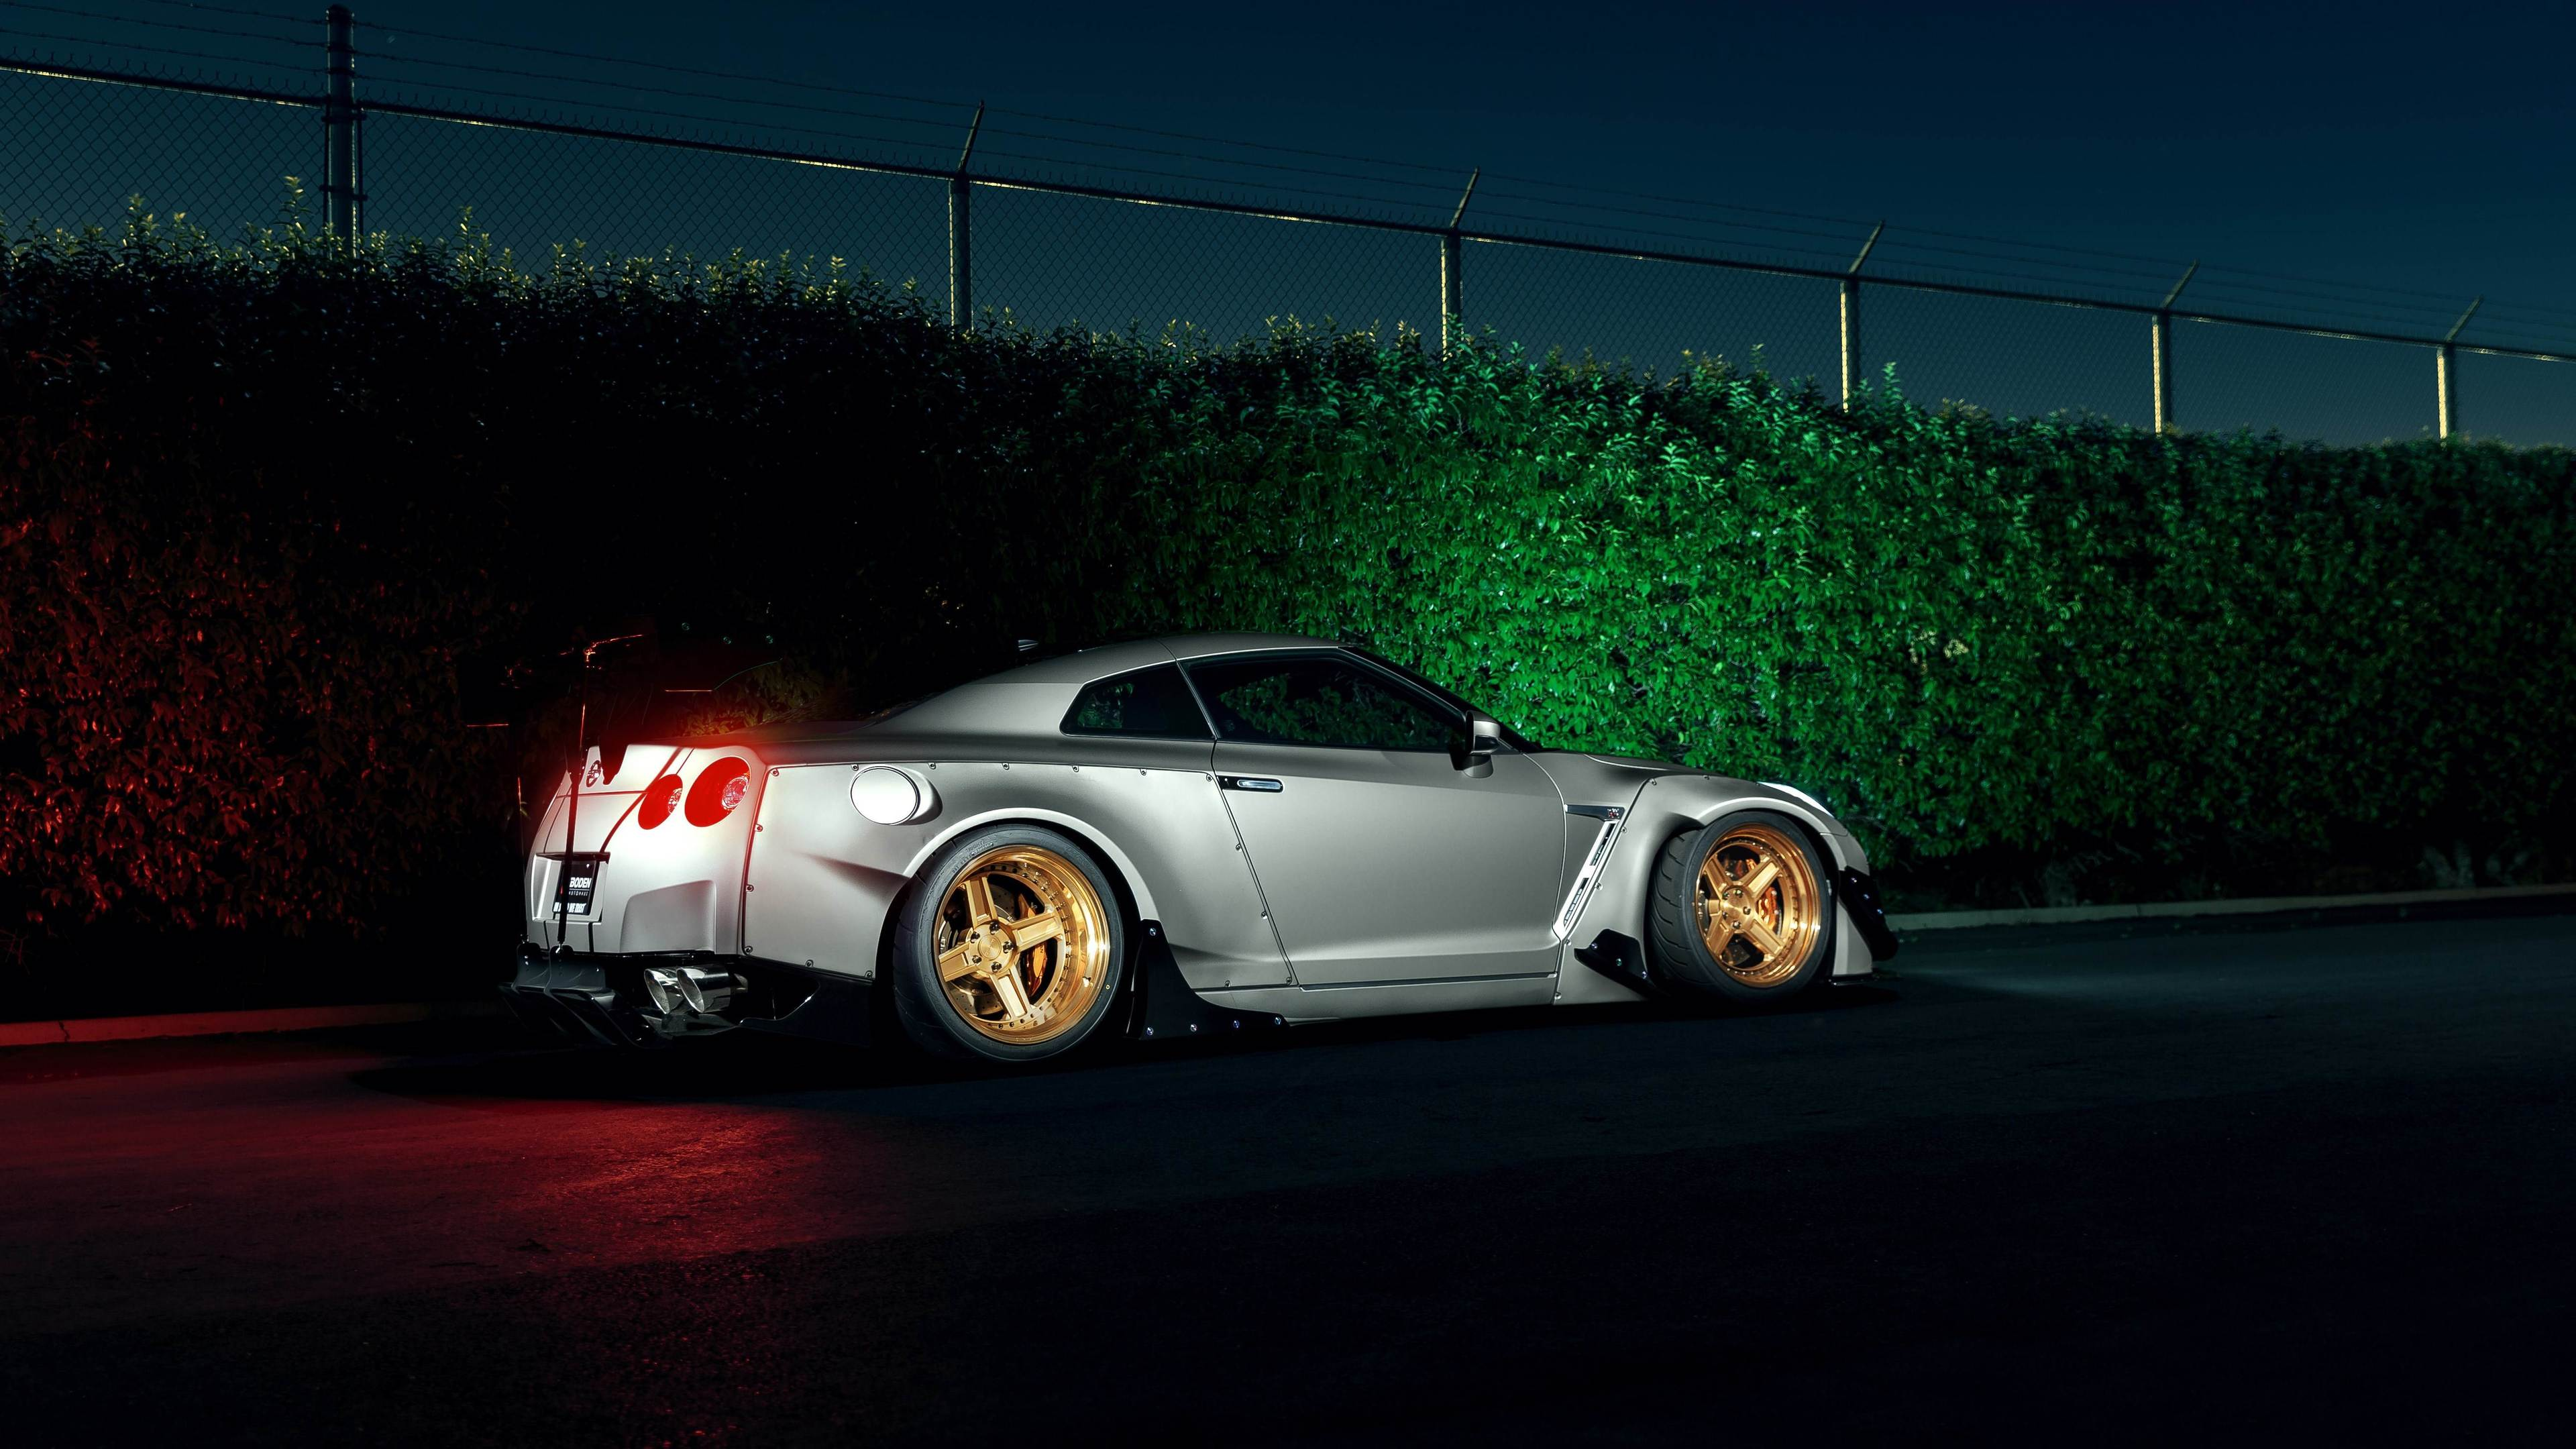 nissan gt r 1539104490 - Nissan GT R - nissan wallpapers, nissan gtr wallpapers, cars wallpapers